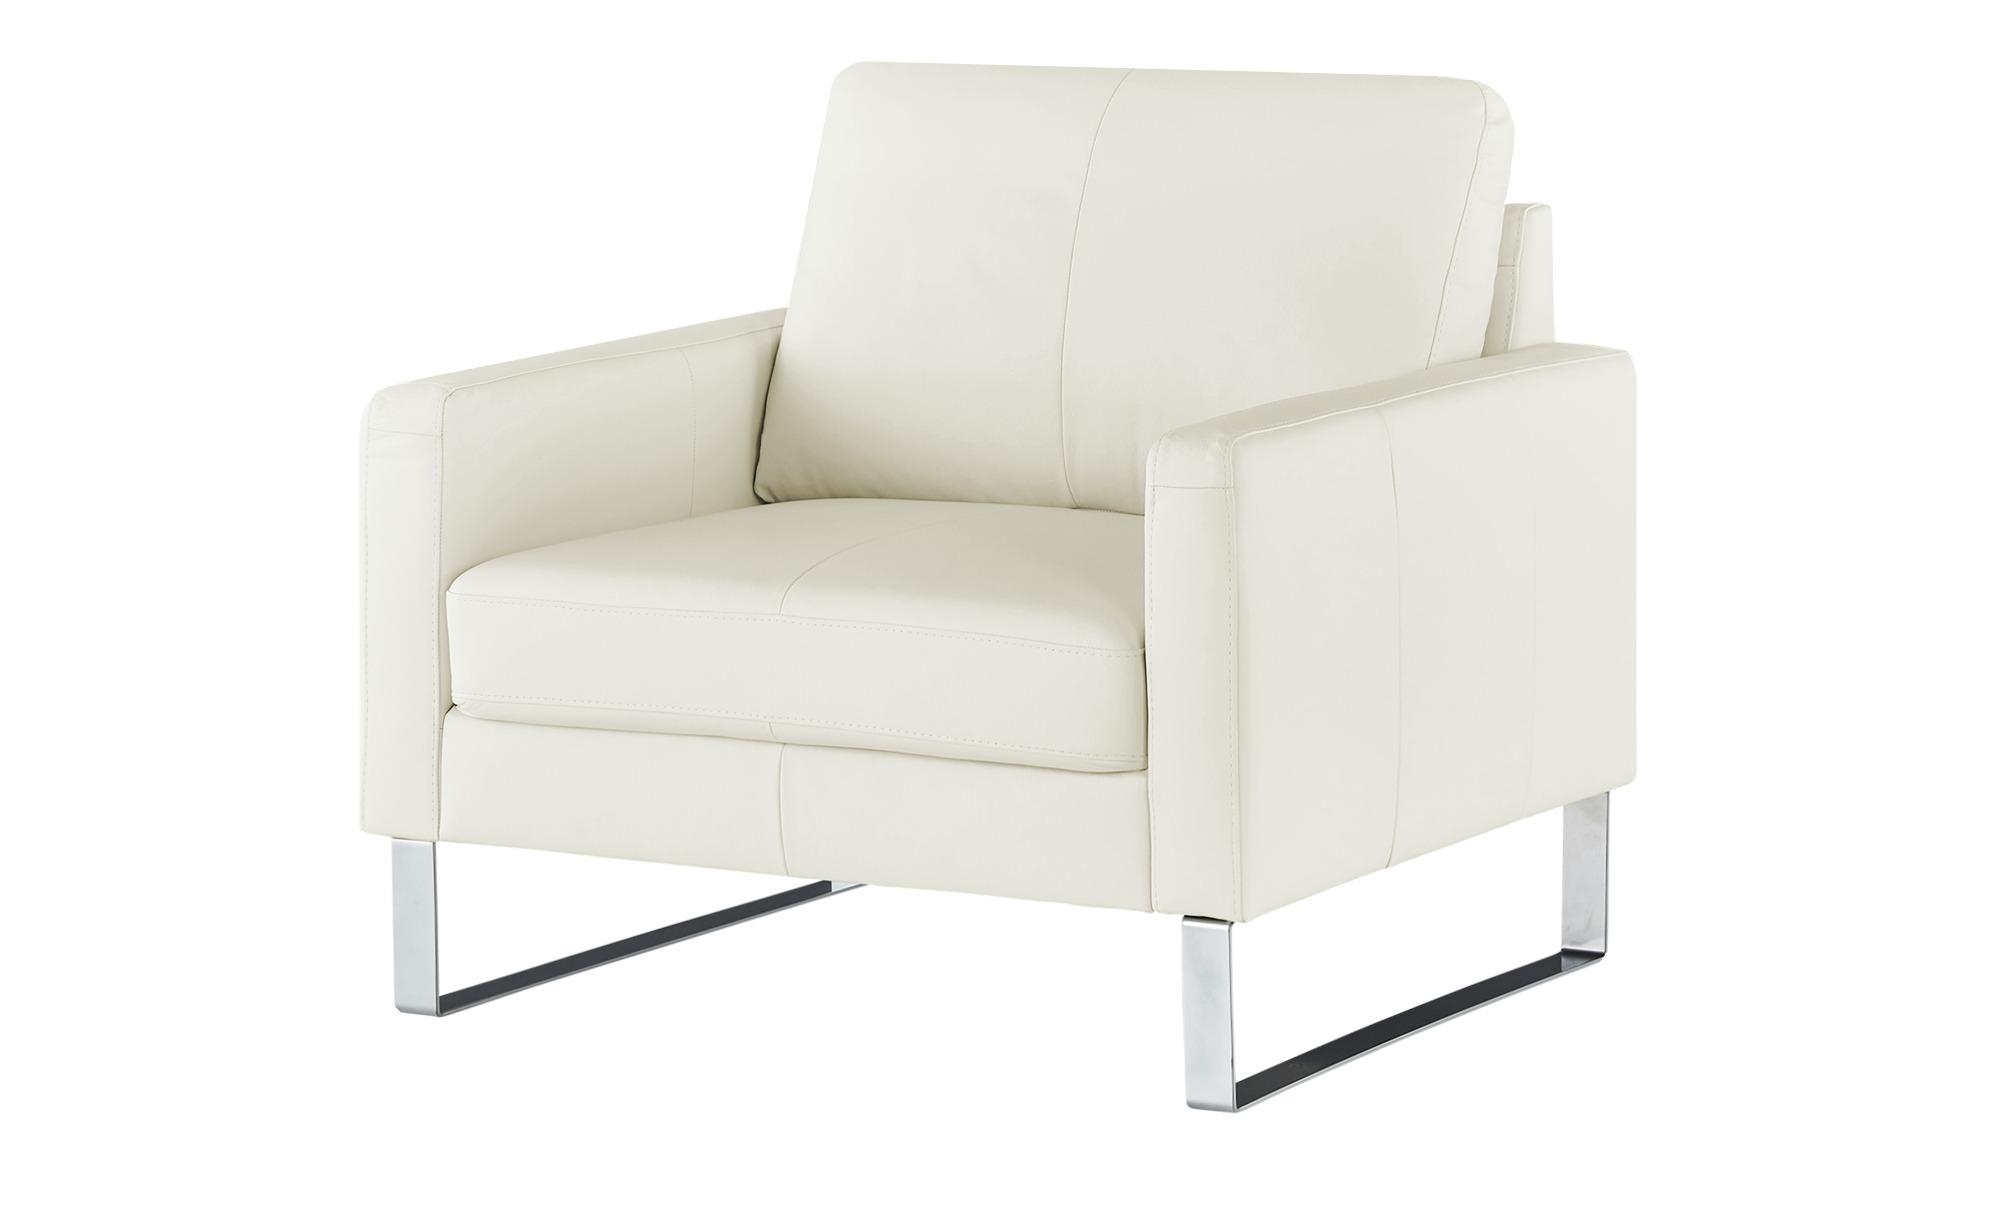 Sessel  Rajaa ¦ weiß ¦ Maße (cm): B: 100 H: 90 T: 93 Polstermöbel > Sessel > Ledersessel - Höffner